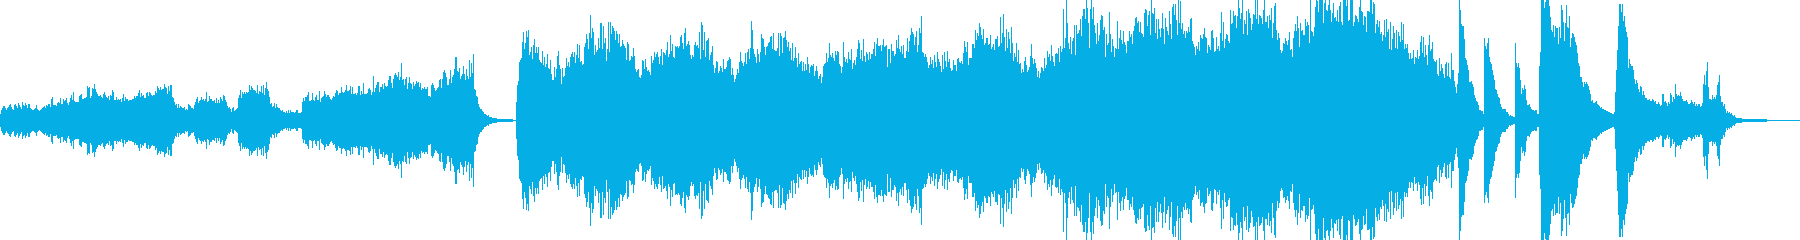 RPG・弦楽合奏の爽やかなイメージ aの再生済みの波形